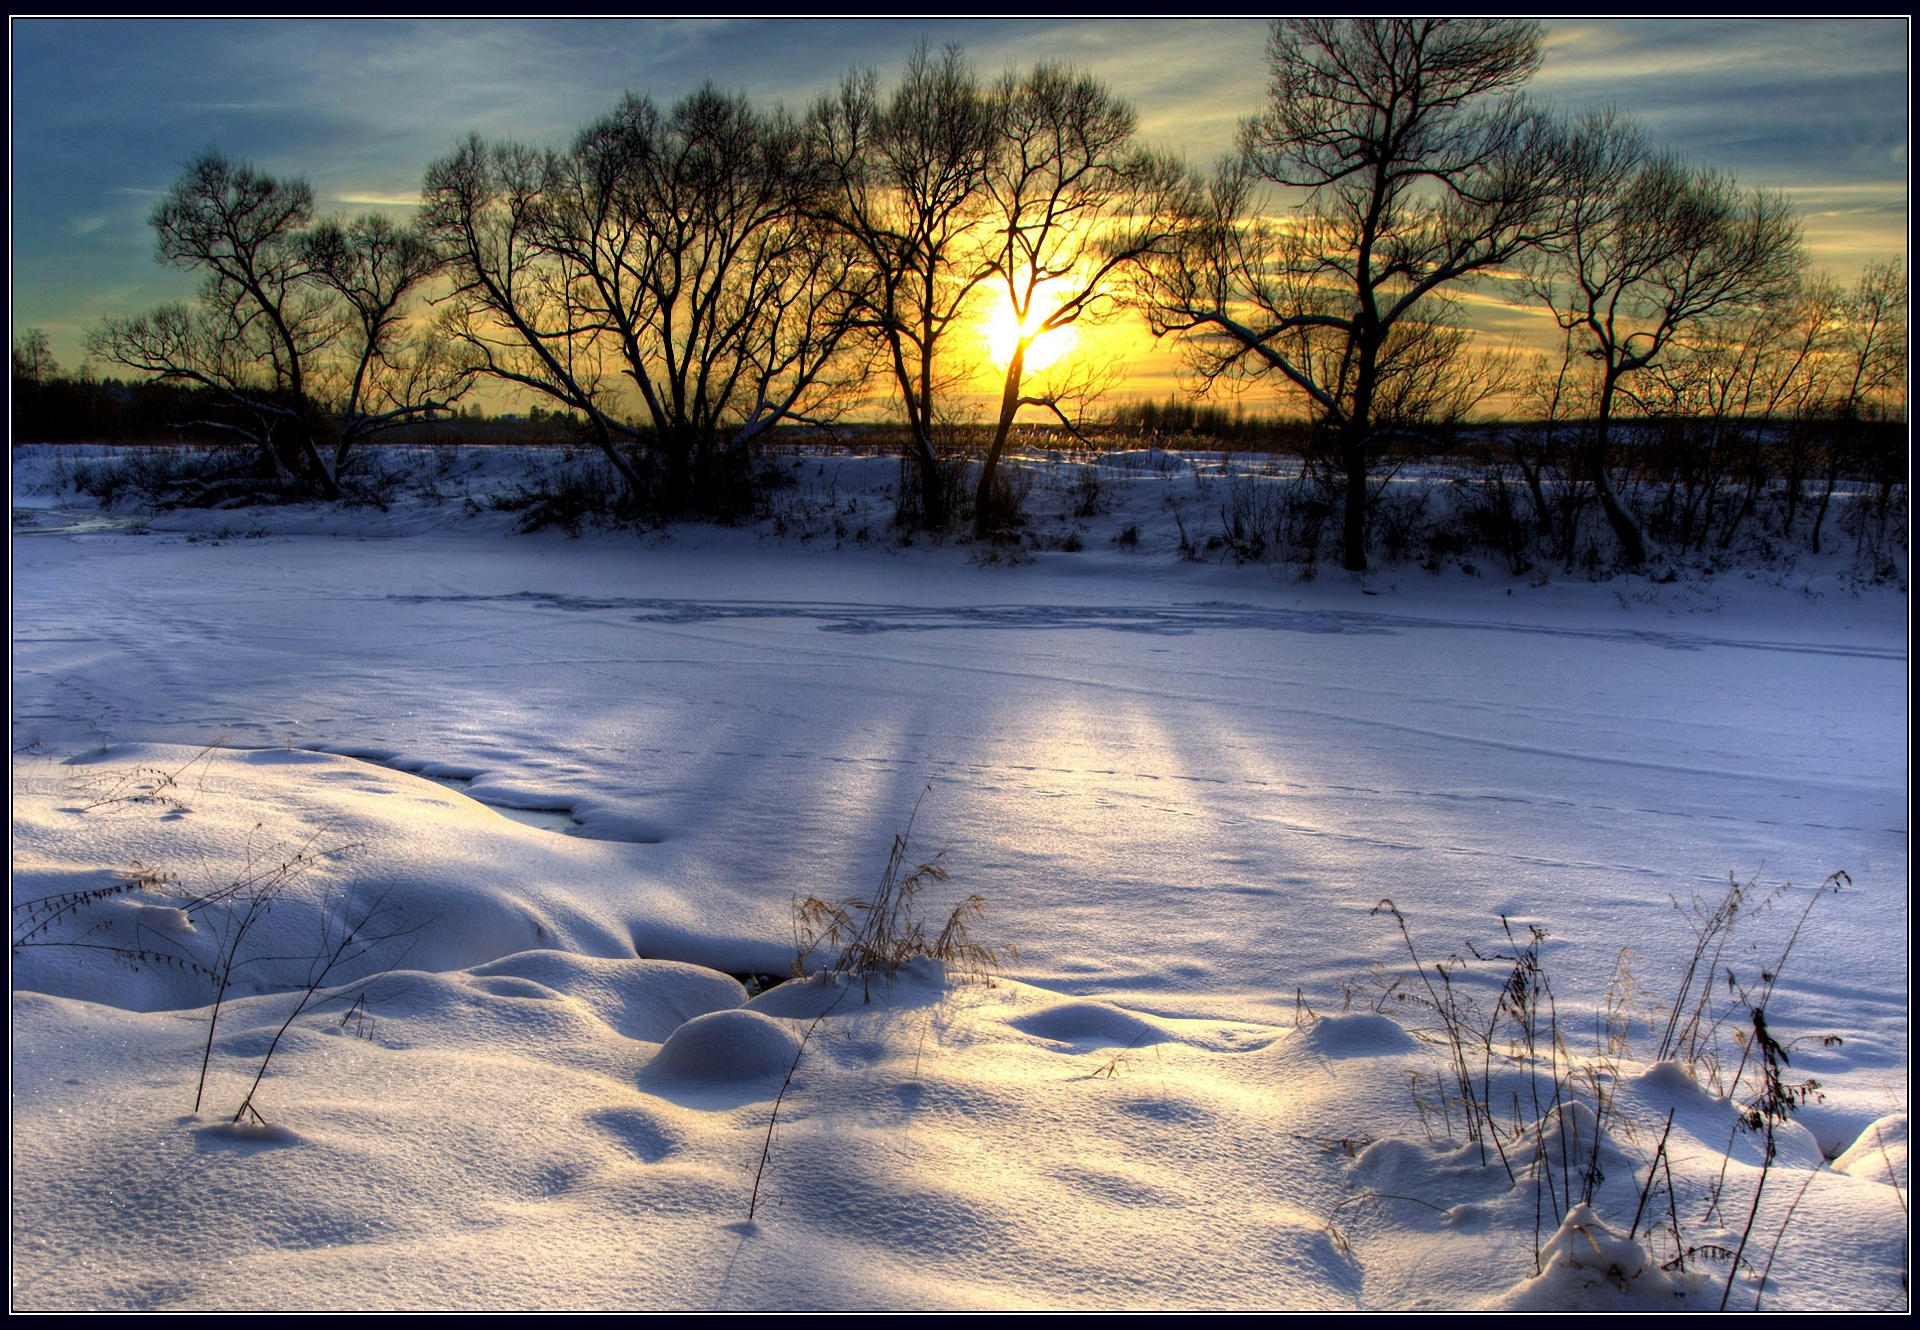 Landscape nature winter sunset snow hdr wallpaper - Wallpaper hd nature winter ...